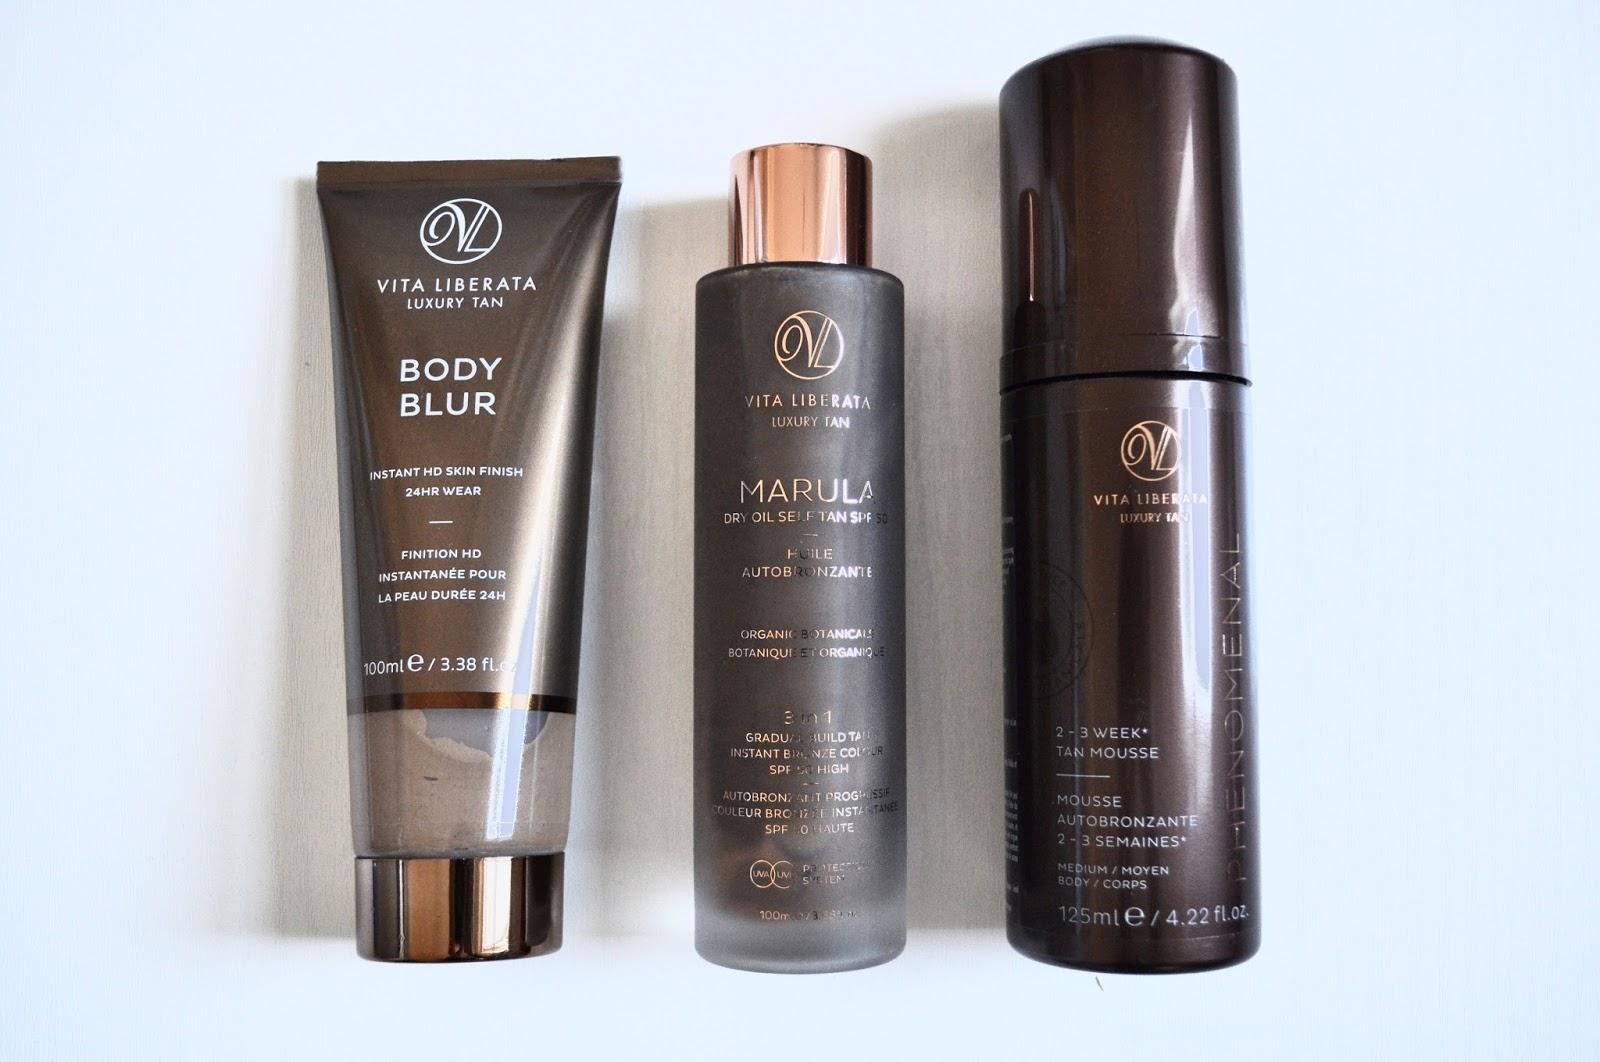 vita liberata body blur instant dry oil self tan marula phenomenal fake tan